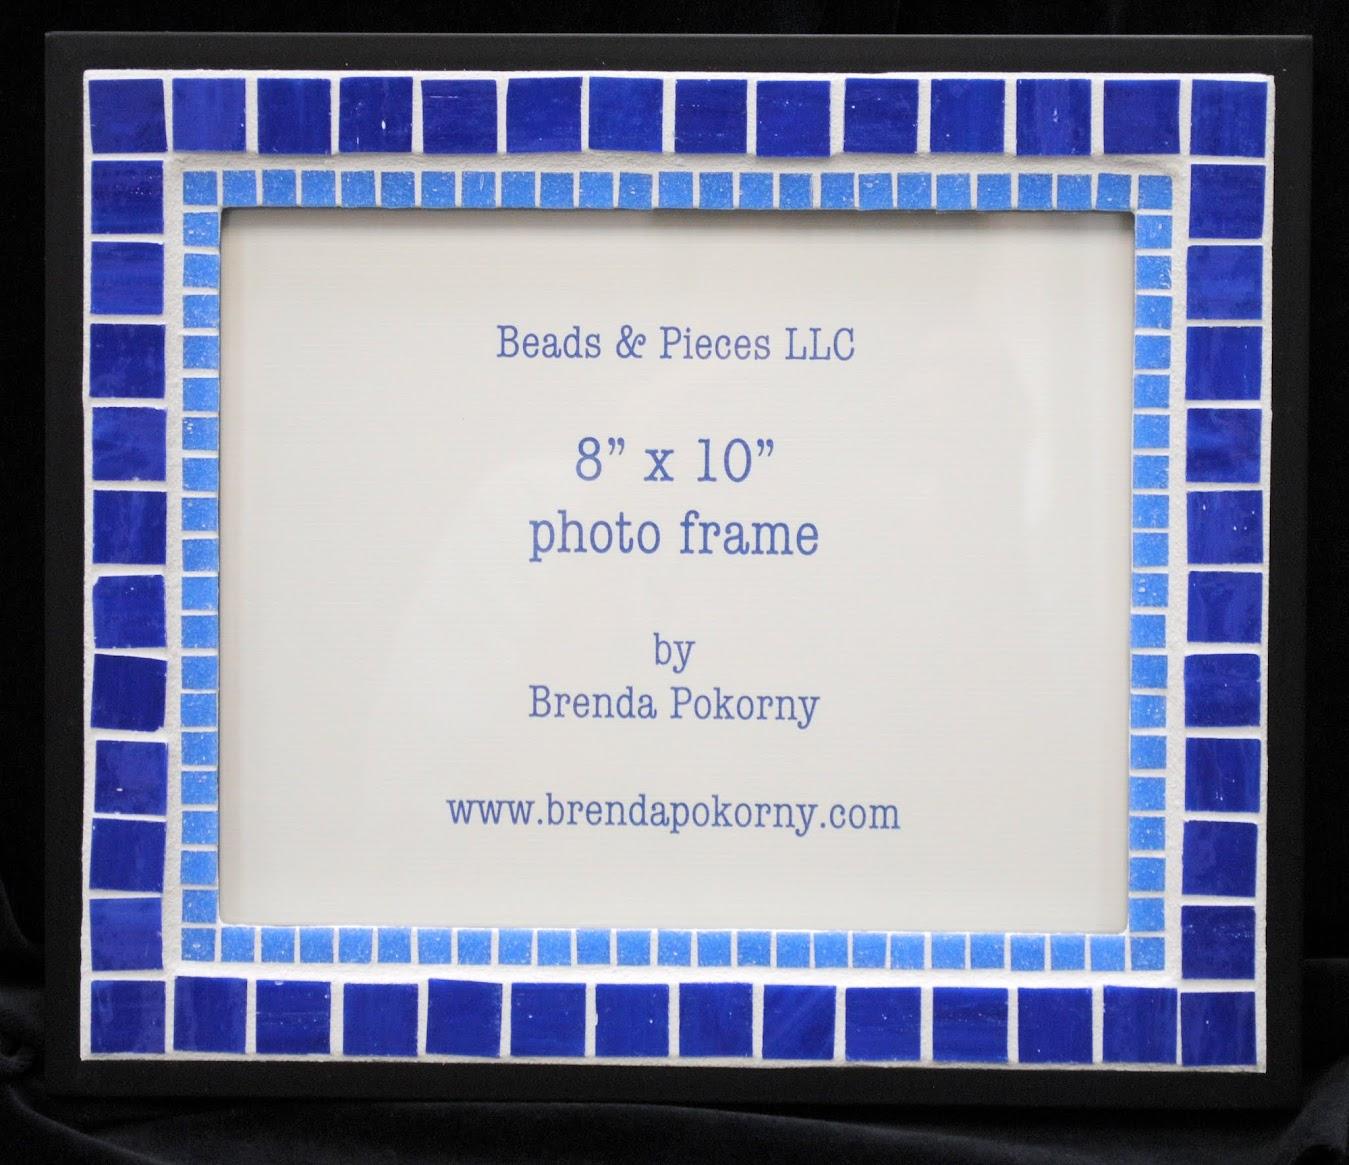 "Two Bright Blues on Black 8"" x 10"" Mosaic Photo Frame MOF1428"